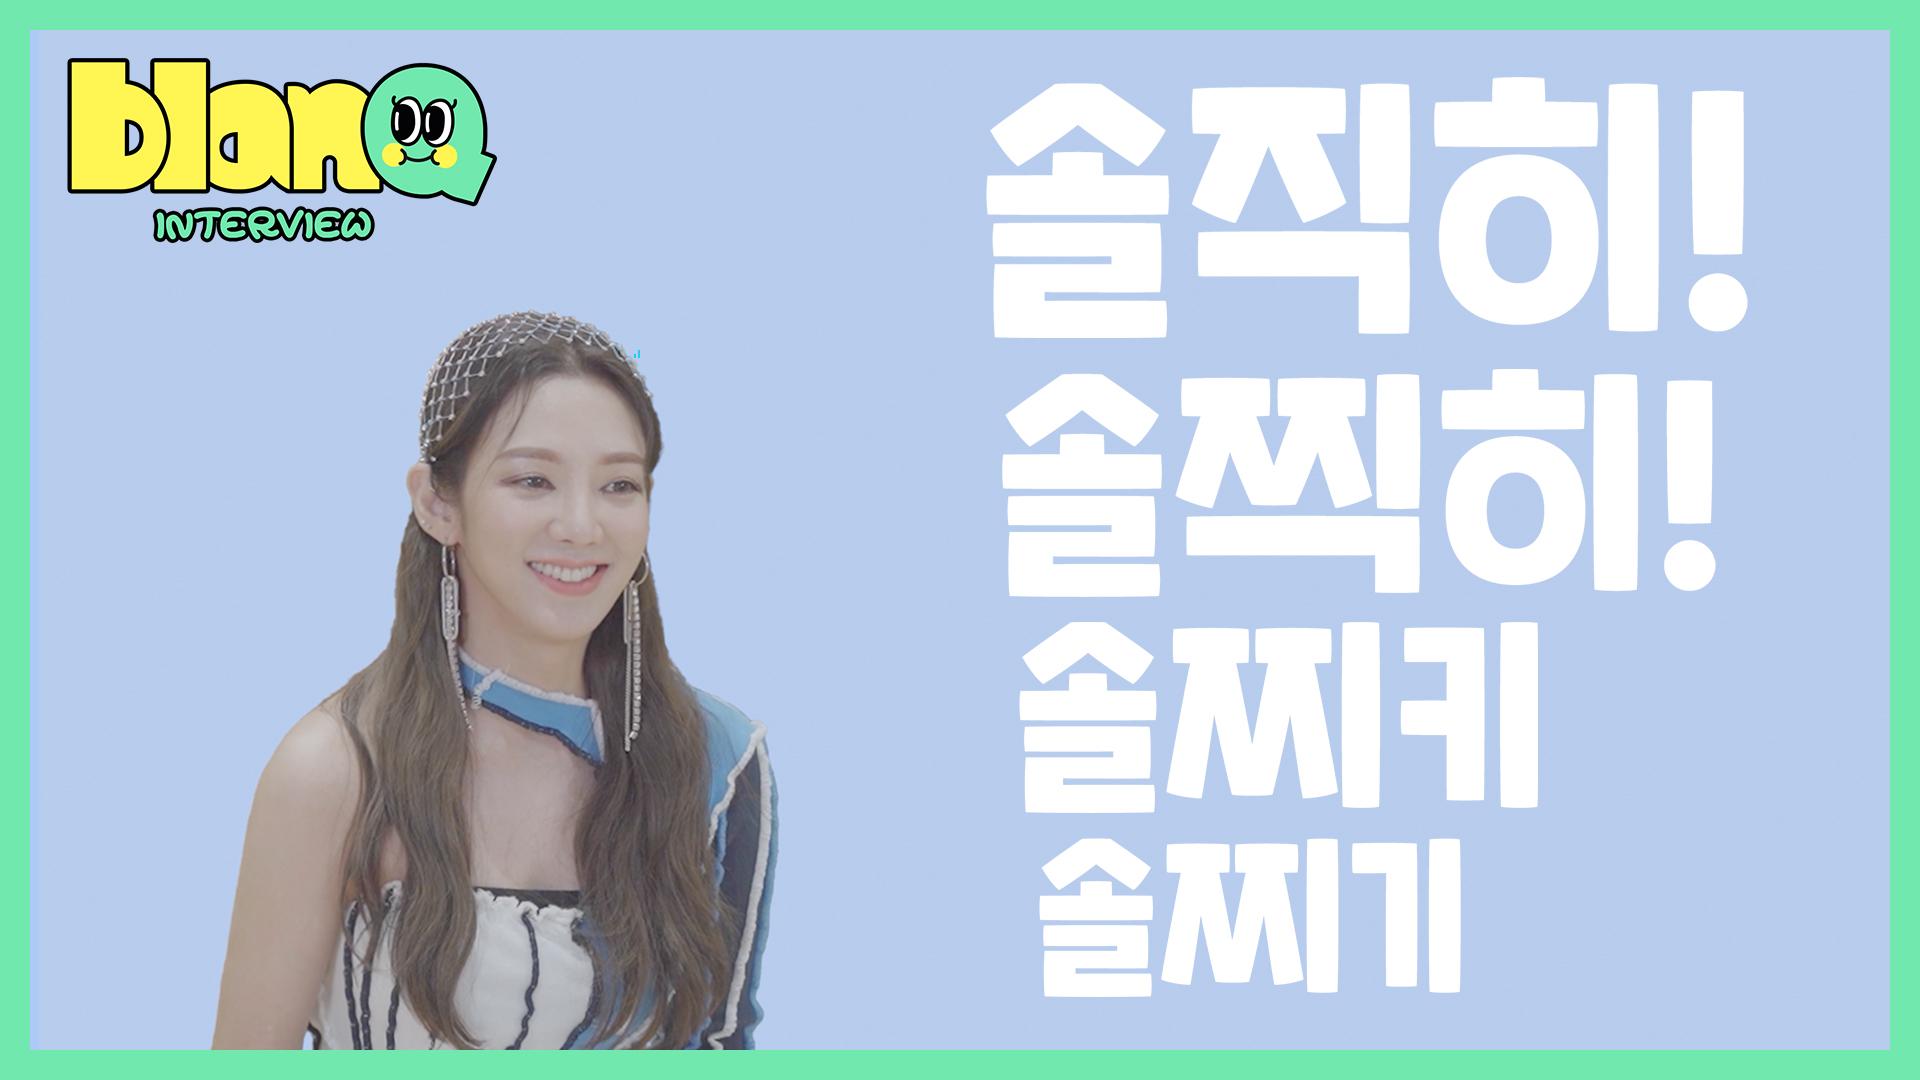 blanQ interview 👀 효연이 솔찌기! 솔찍히!! 말하고 싶었던 것은?